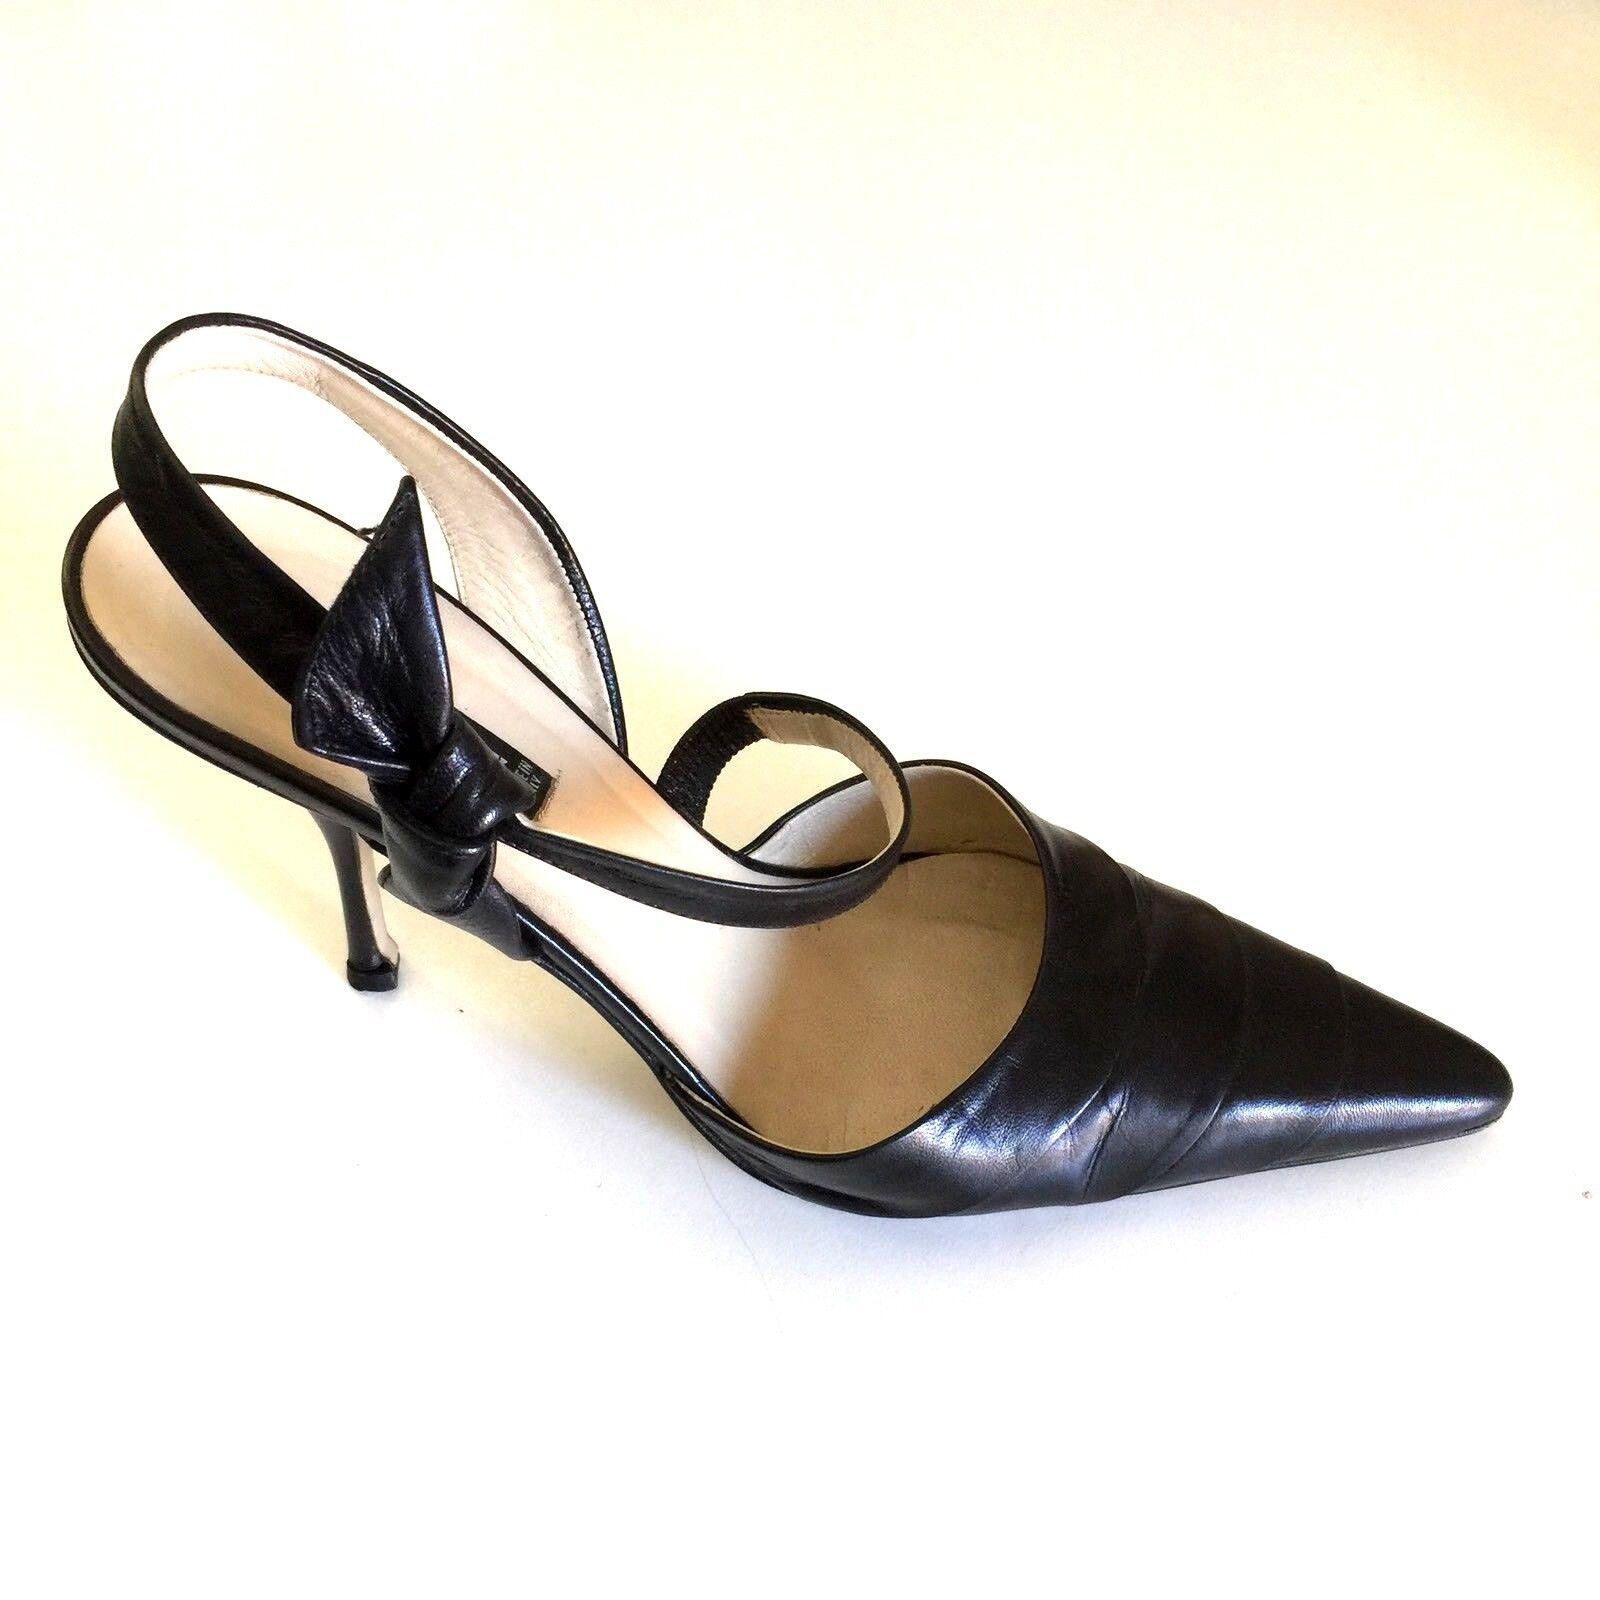 Claudia Ciuti Pumps Black Leather Slingback Bow 8 M Pointed Toe Slim Heel